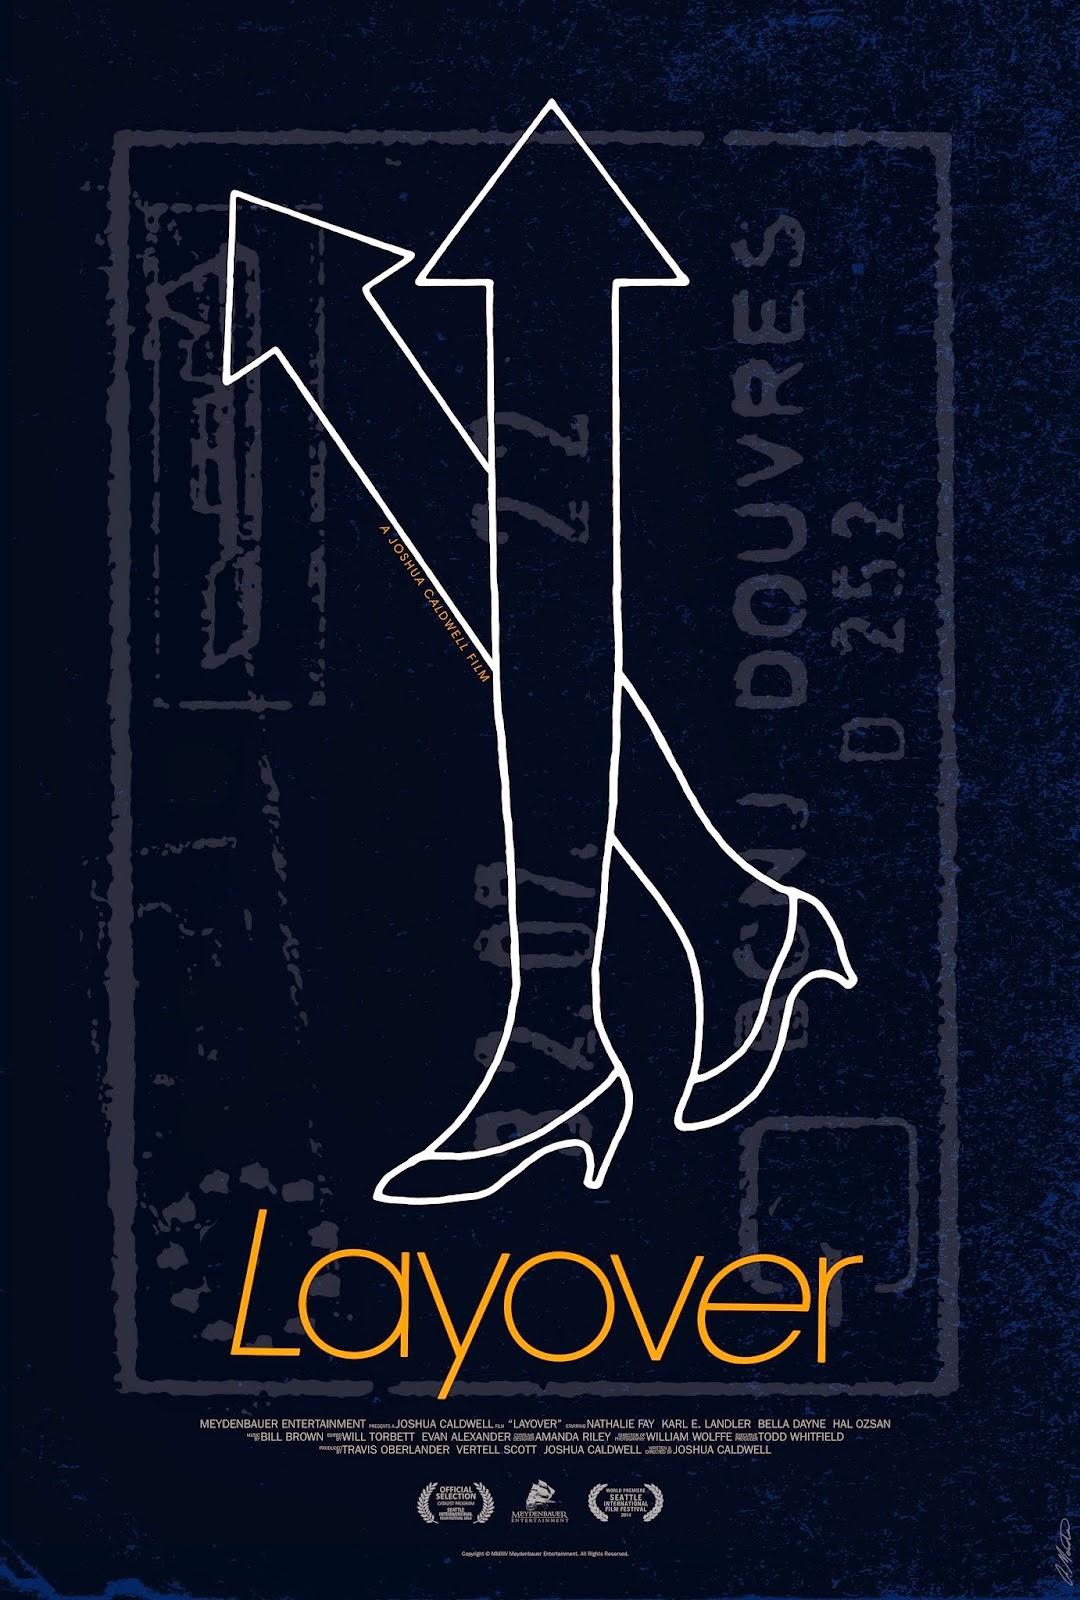 LayoverFilmPoster_usedwpermission.jpg